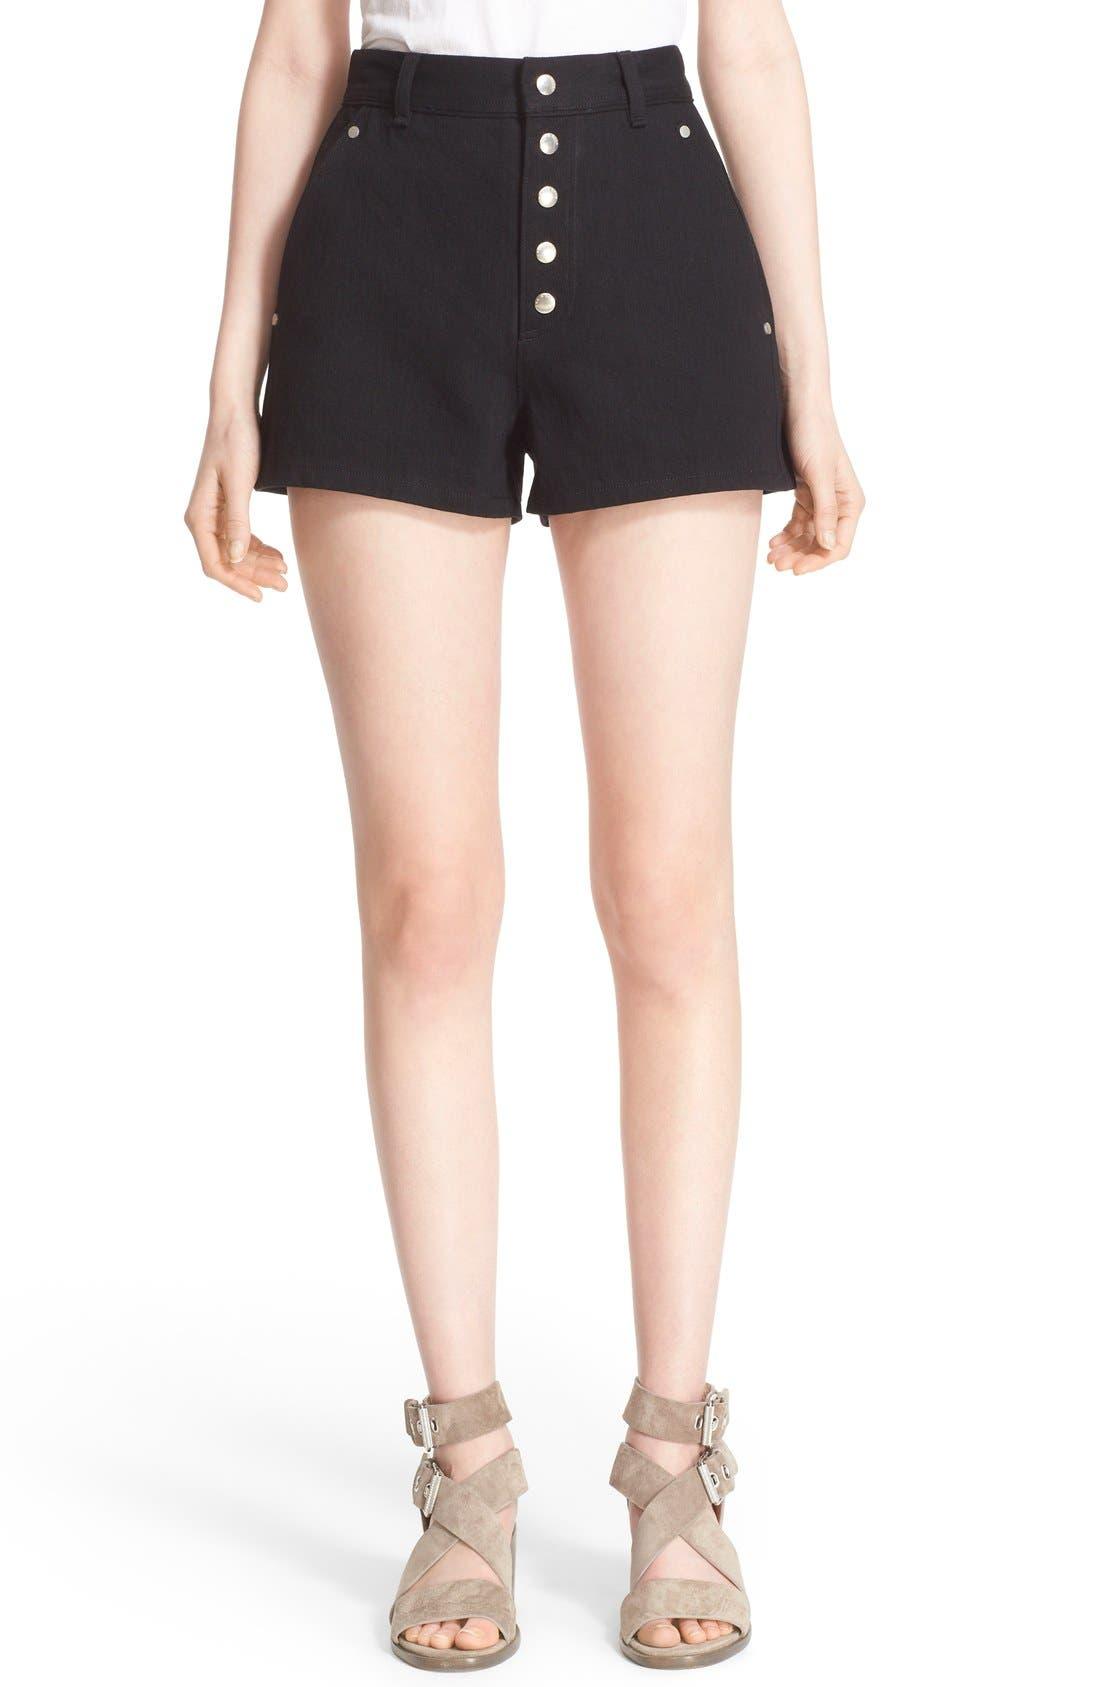 Alternate Image 1 Selected - rag & bone 'Branson' High Waist Shorts